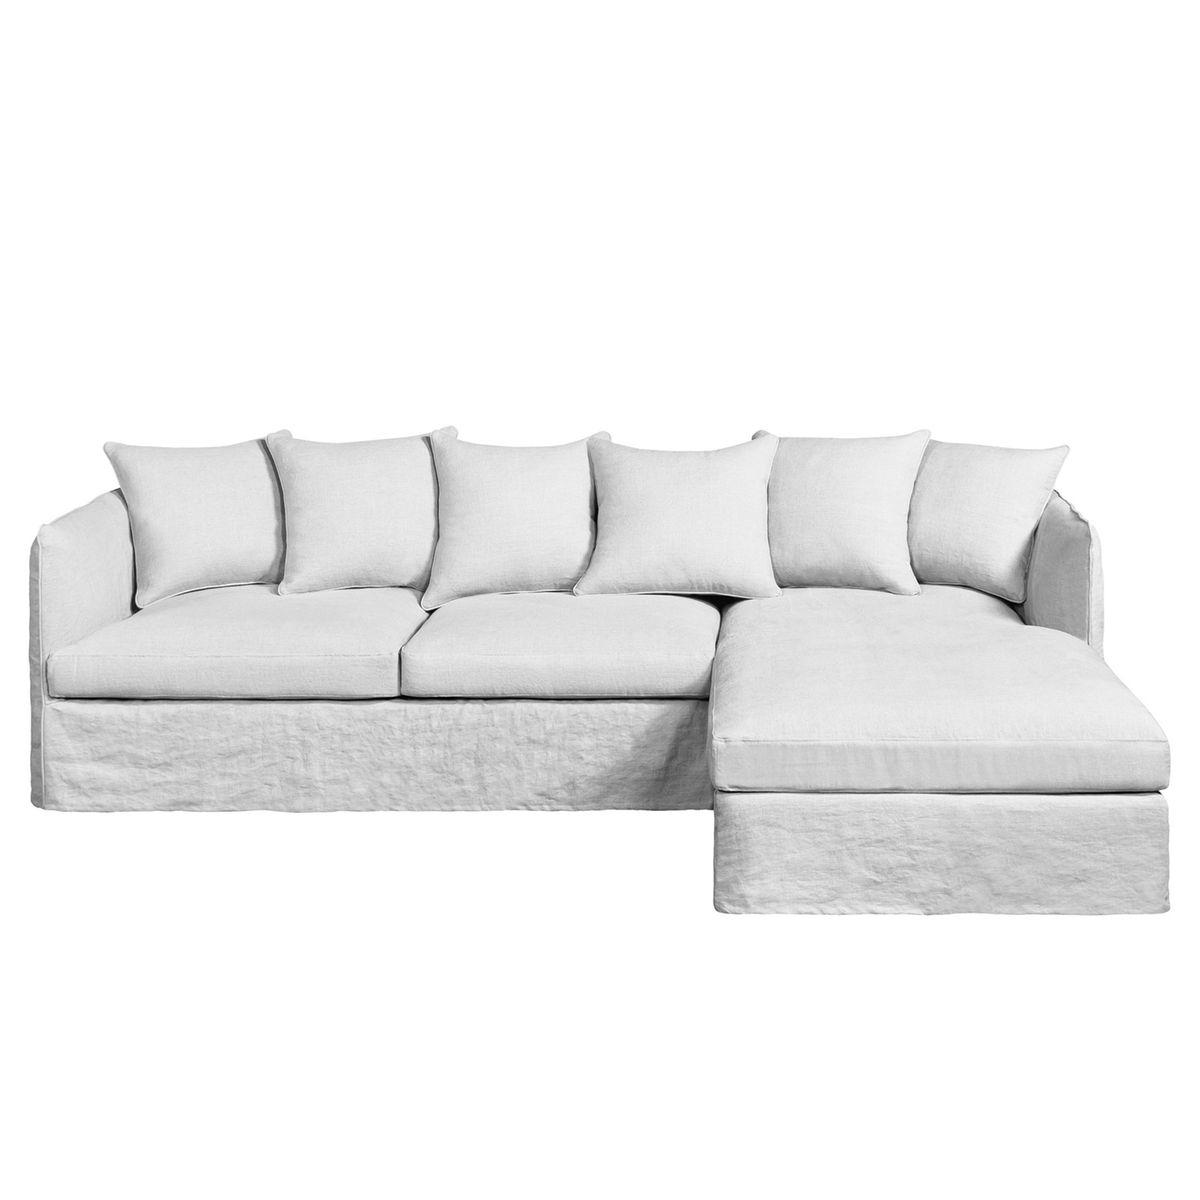 vente suspension tritoo maison et jardin. Black Bedroom Furniture Sets. Home Design Ideas